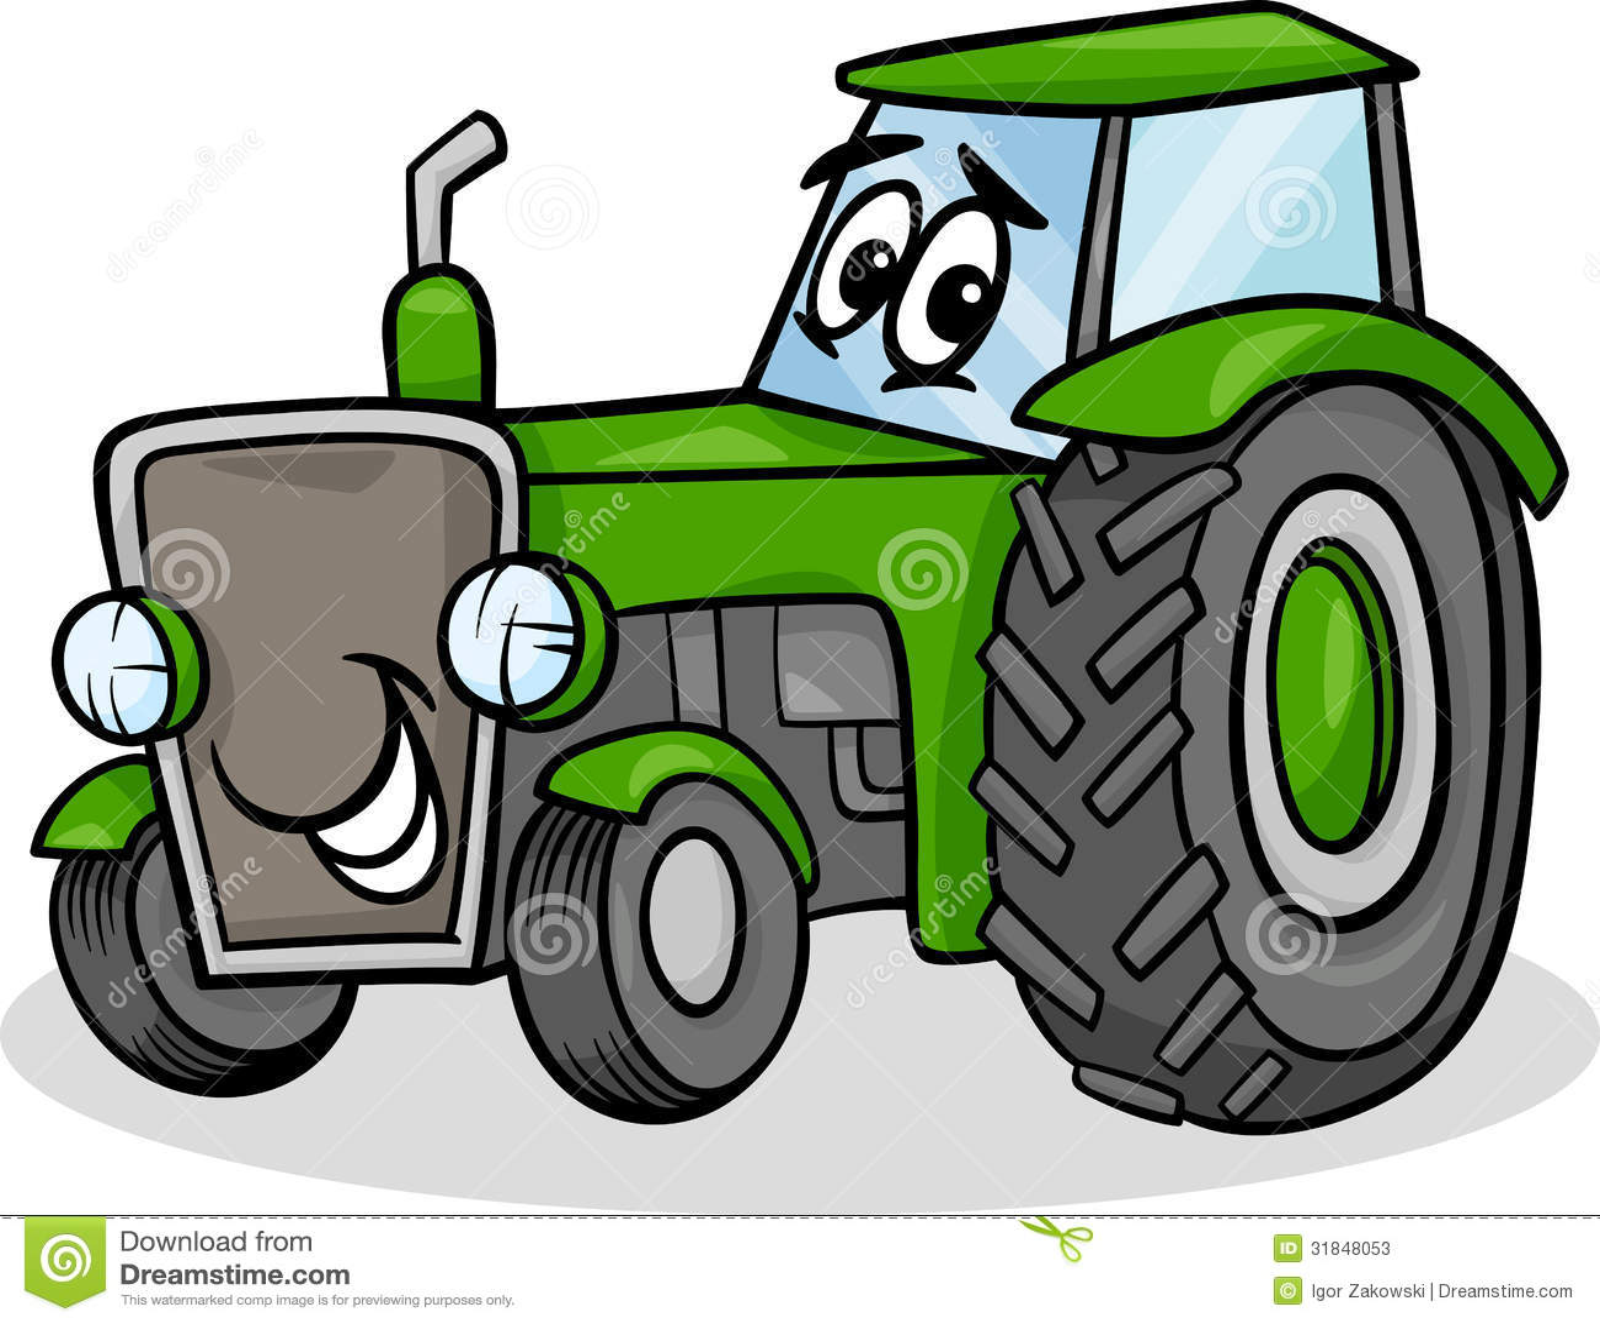 Cartoon Tractor Clip Art : Tractor character cartoon illustration stock vector